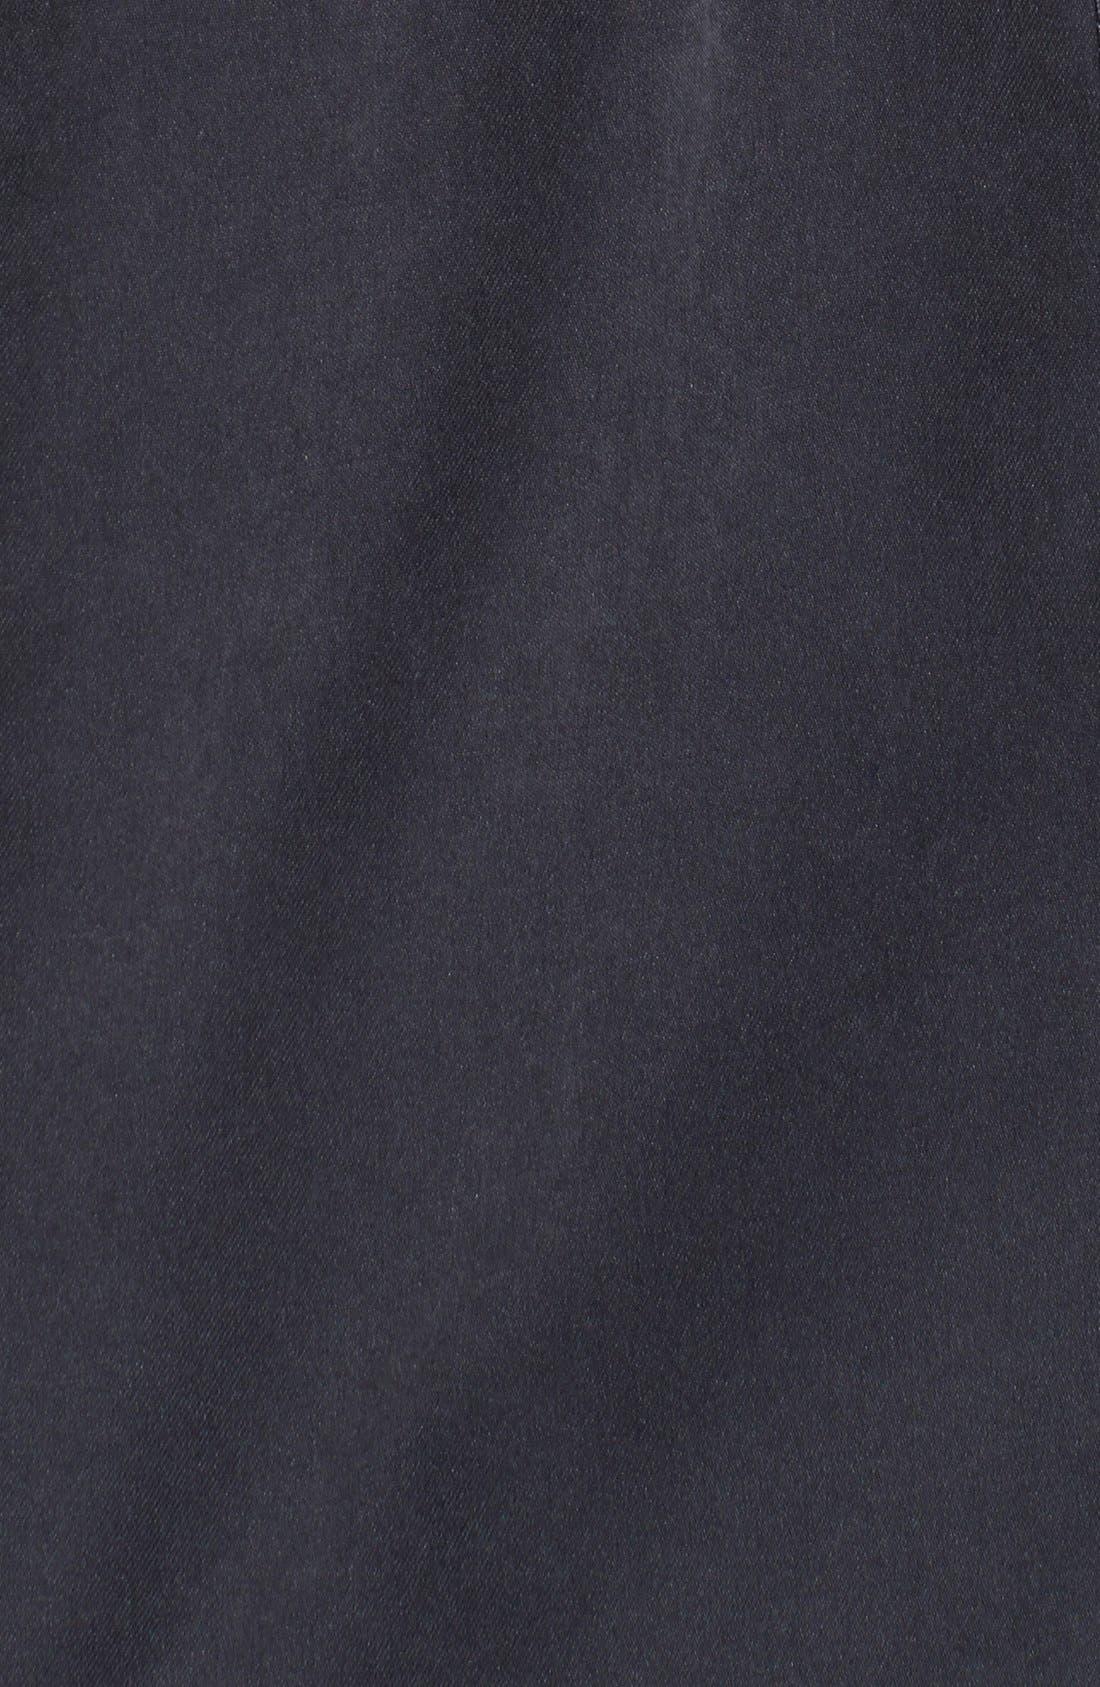 DKNY, Faux Fur Trim Anorak, Alternate thumbnail 2, color, 001